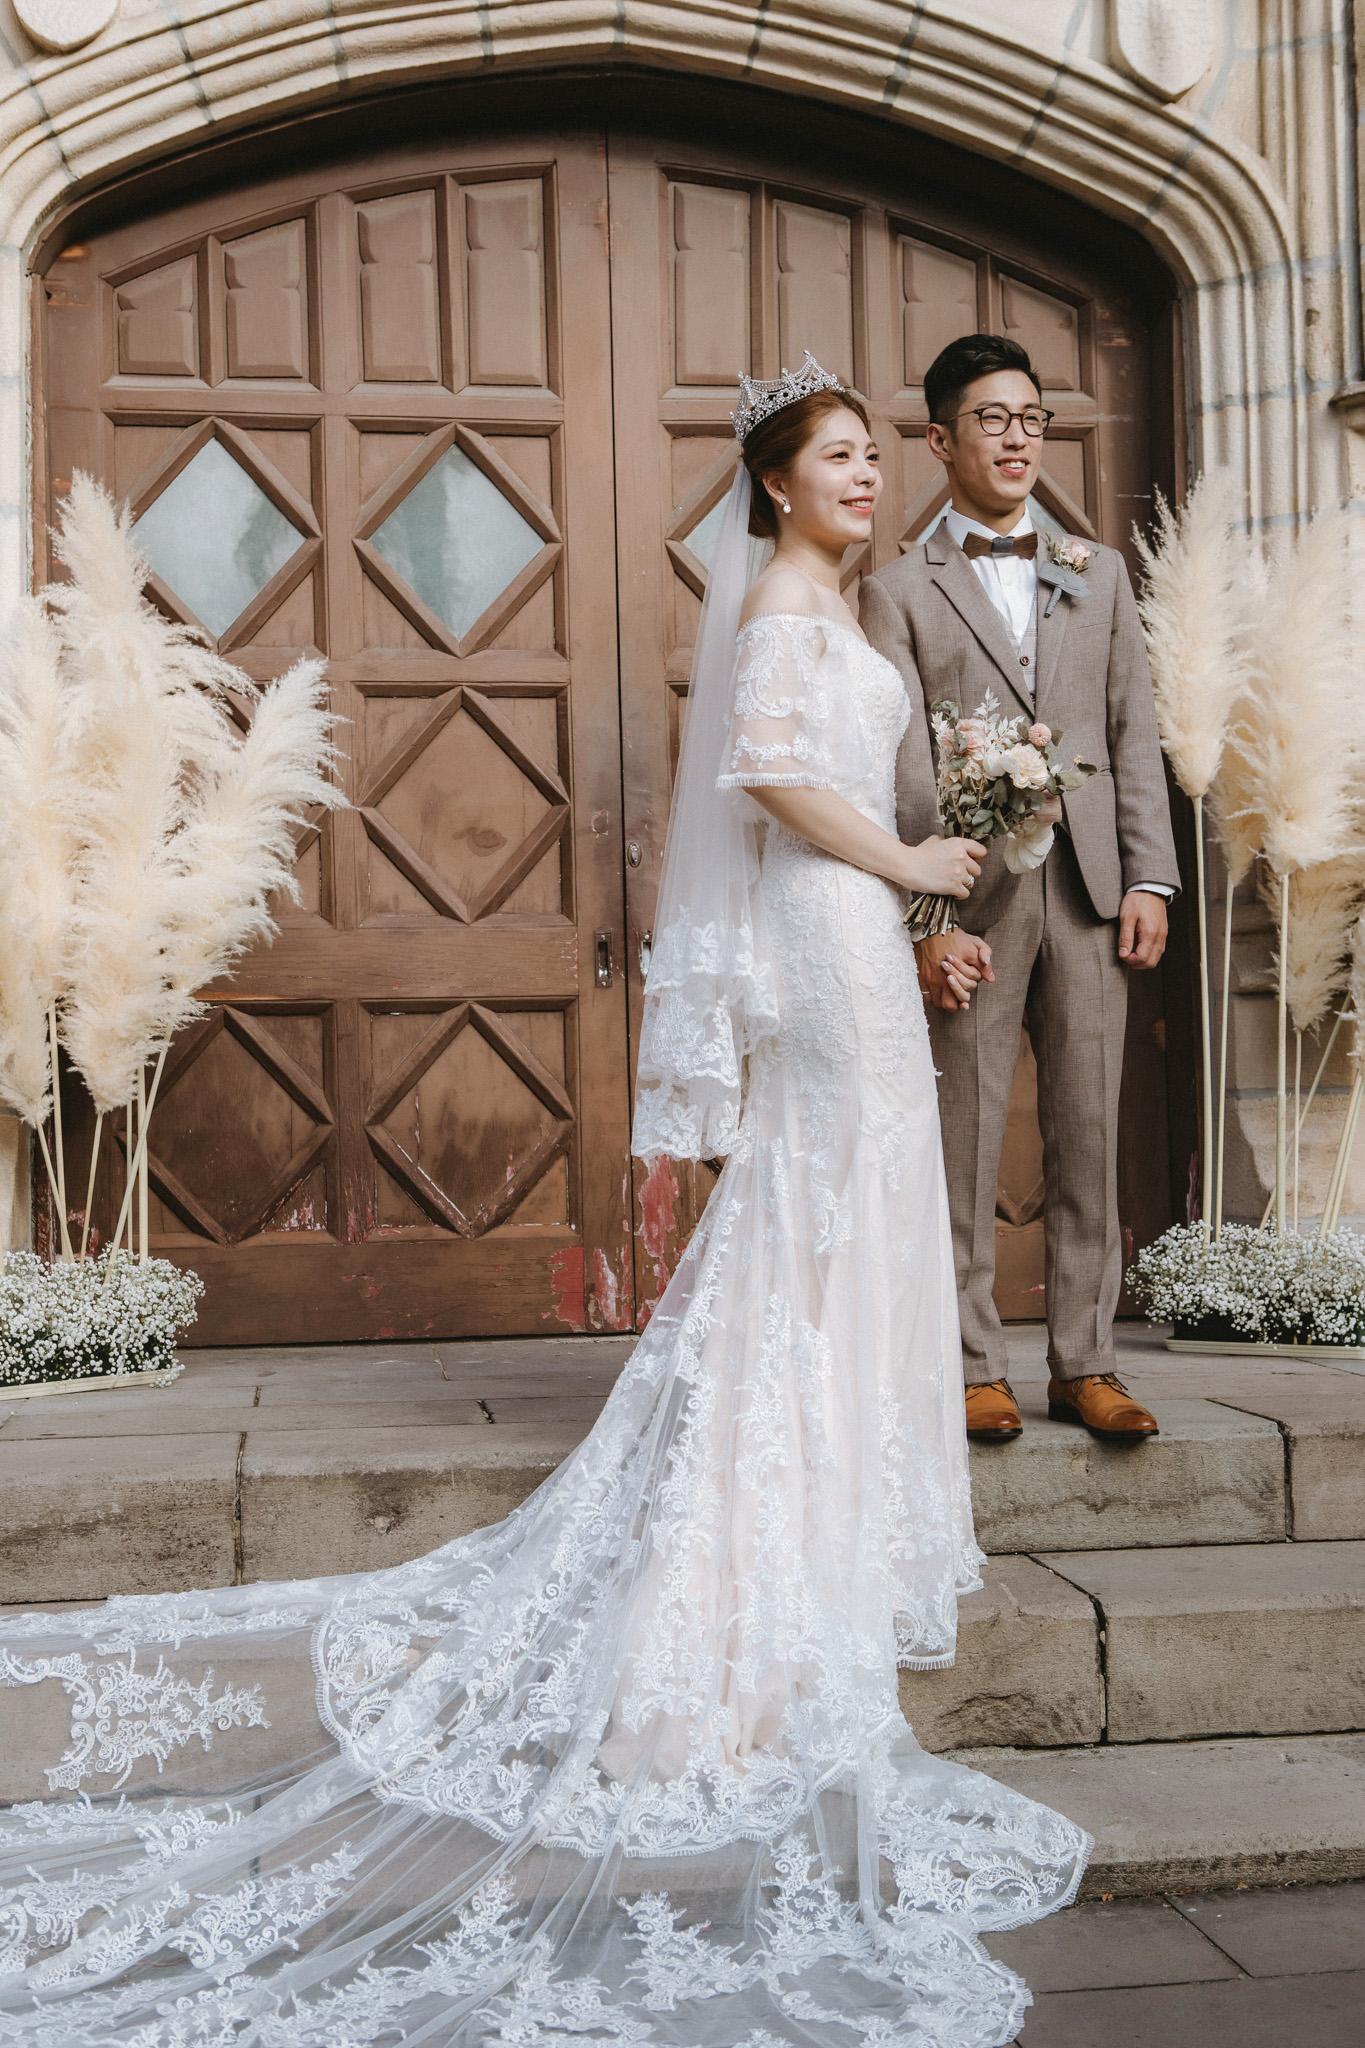 EW 台北婚攝 居米 濟南教會 Brick Yard 33 美軍俱樂部 婚禮 婚宴-55